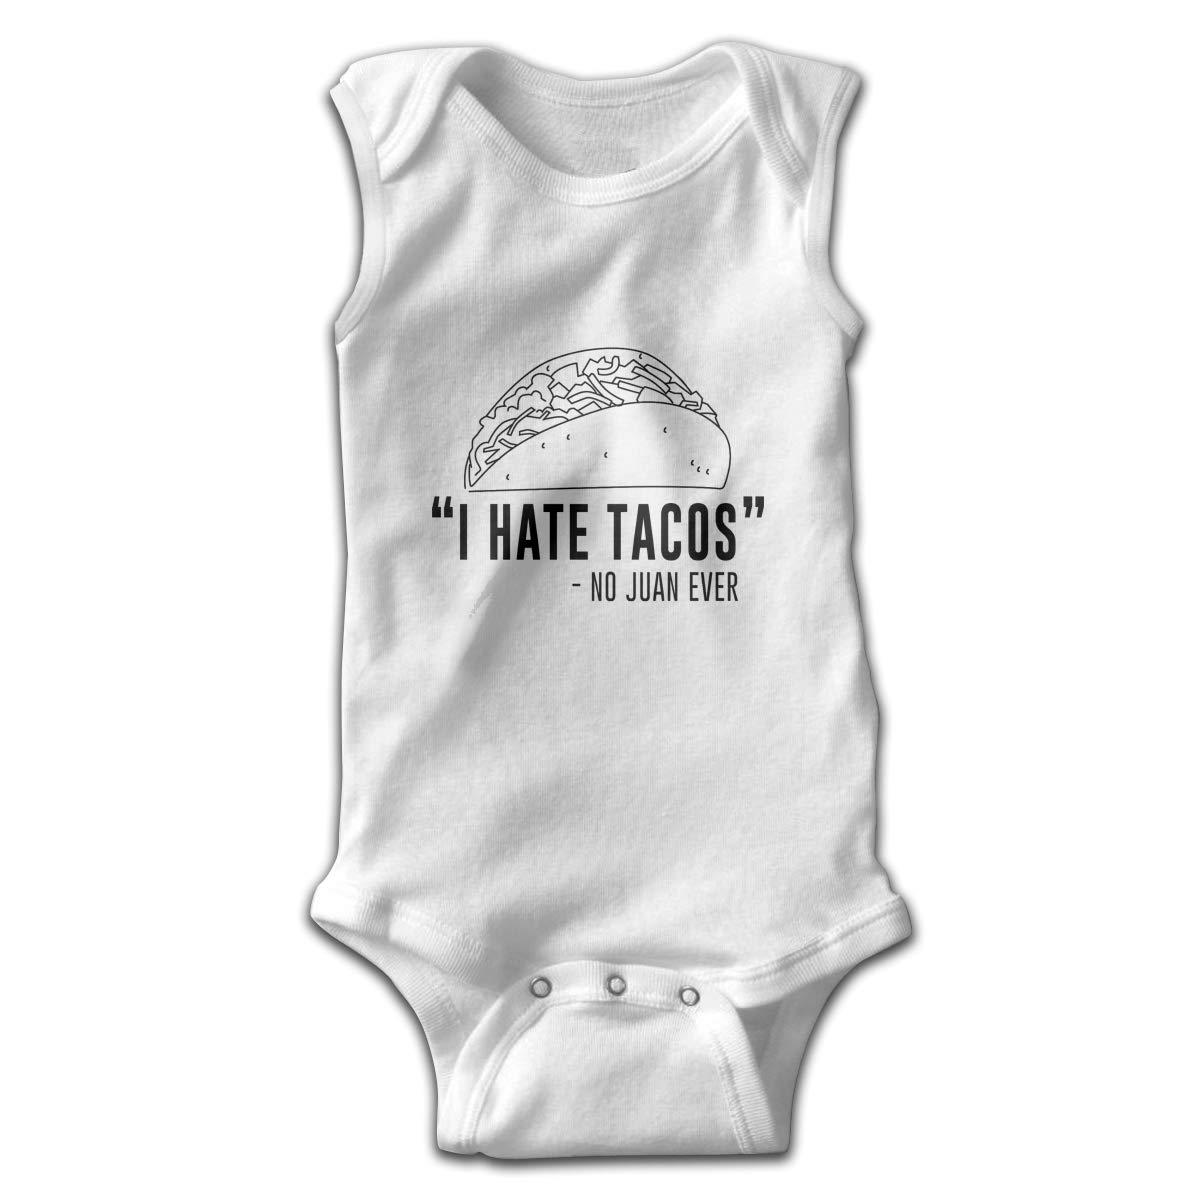 Toddler Baby Boys Rompers Sleeveless Cotton Jumpsuit,I Hate Tacos Said No Juan Ever Bodysuit Autumn Pajamas